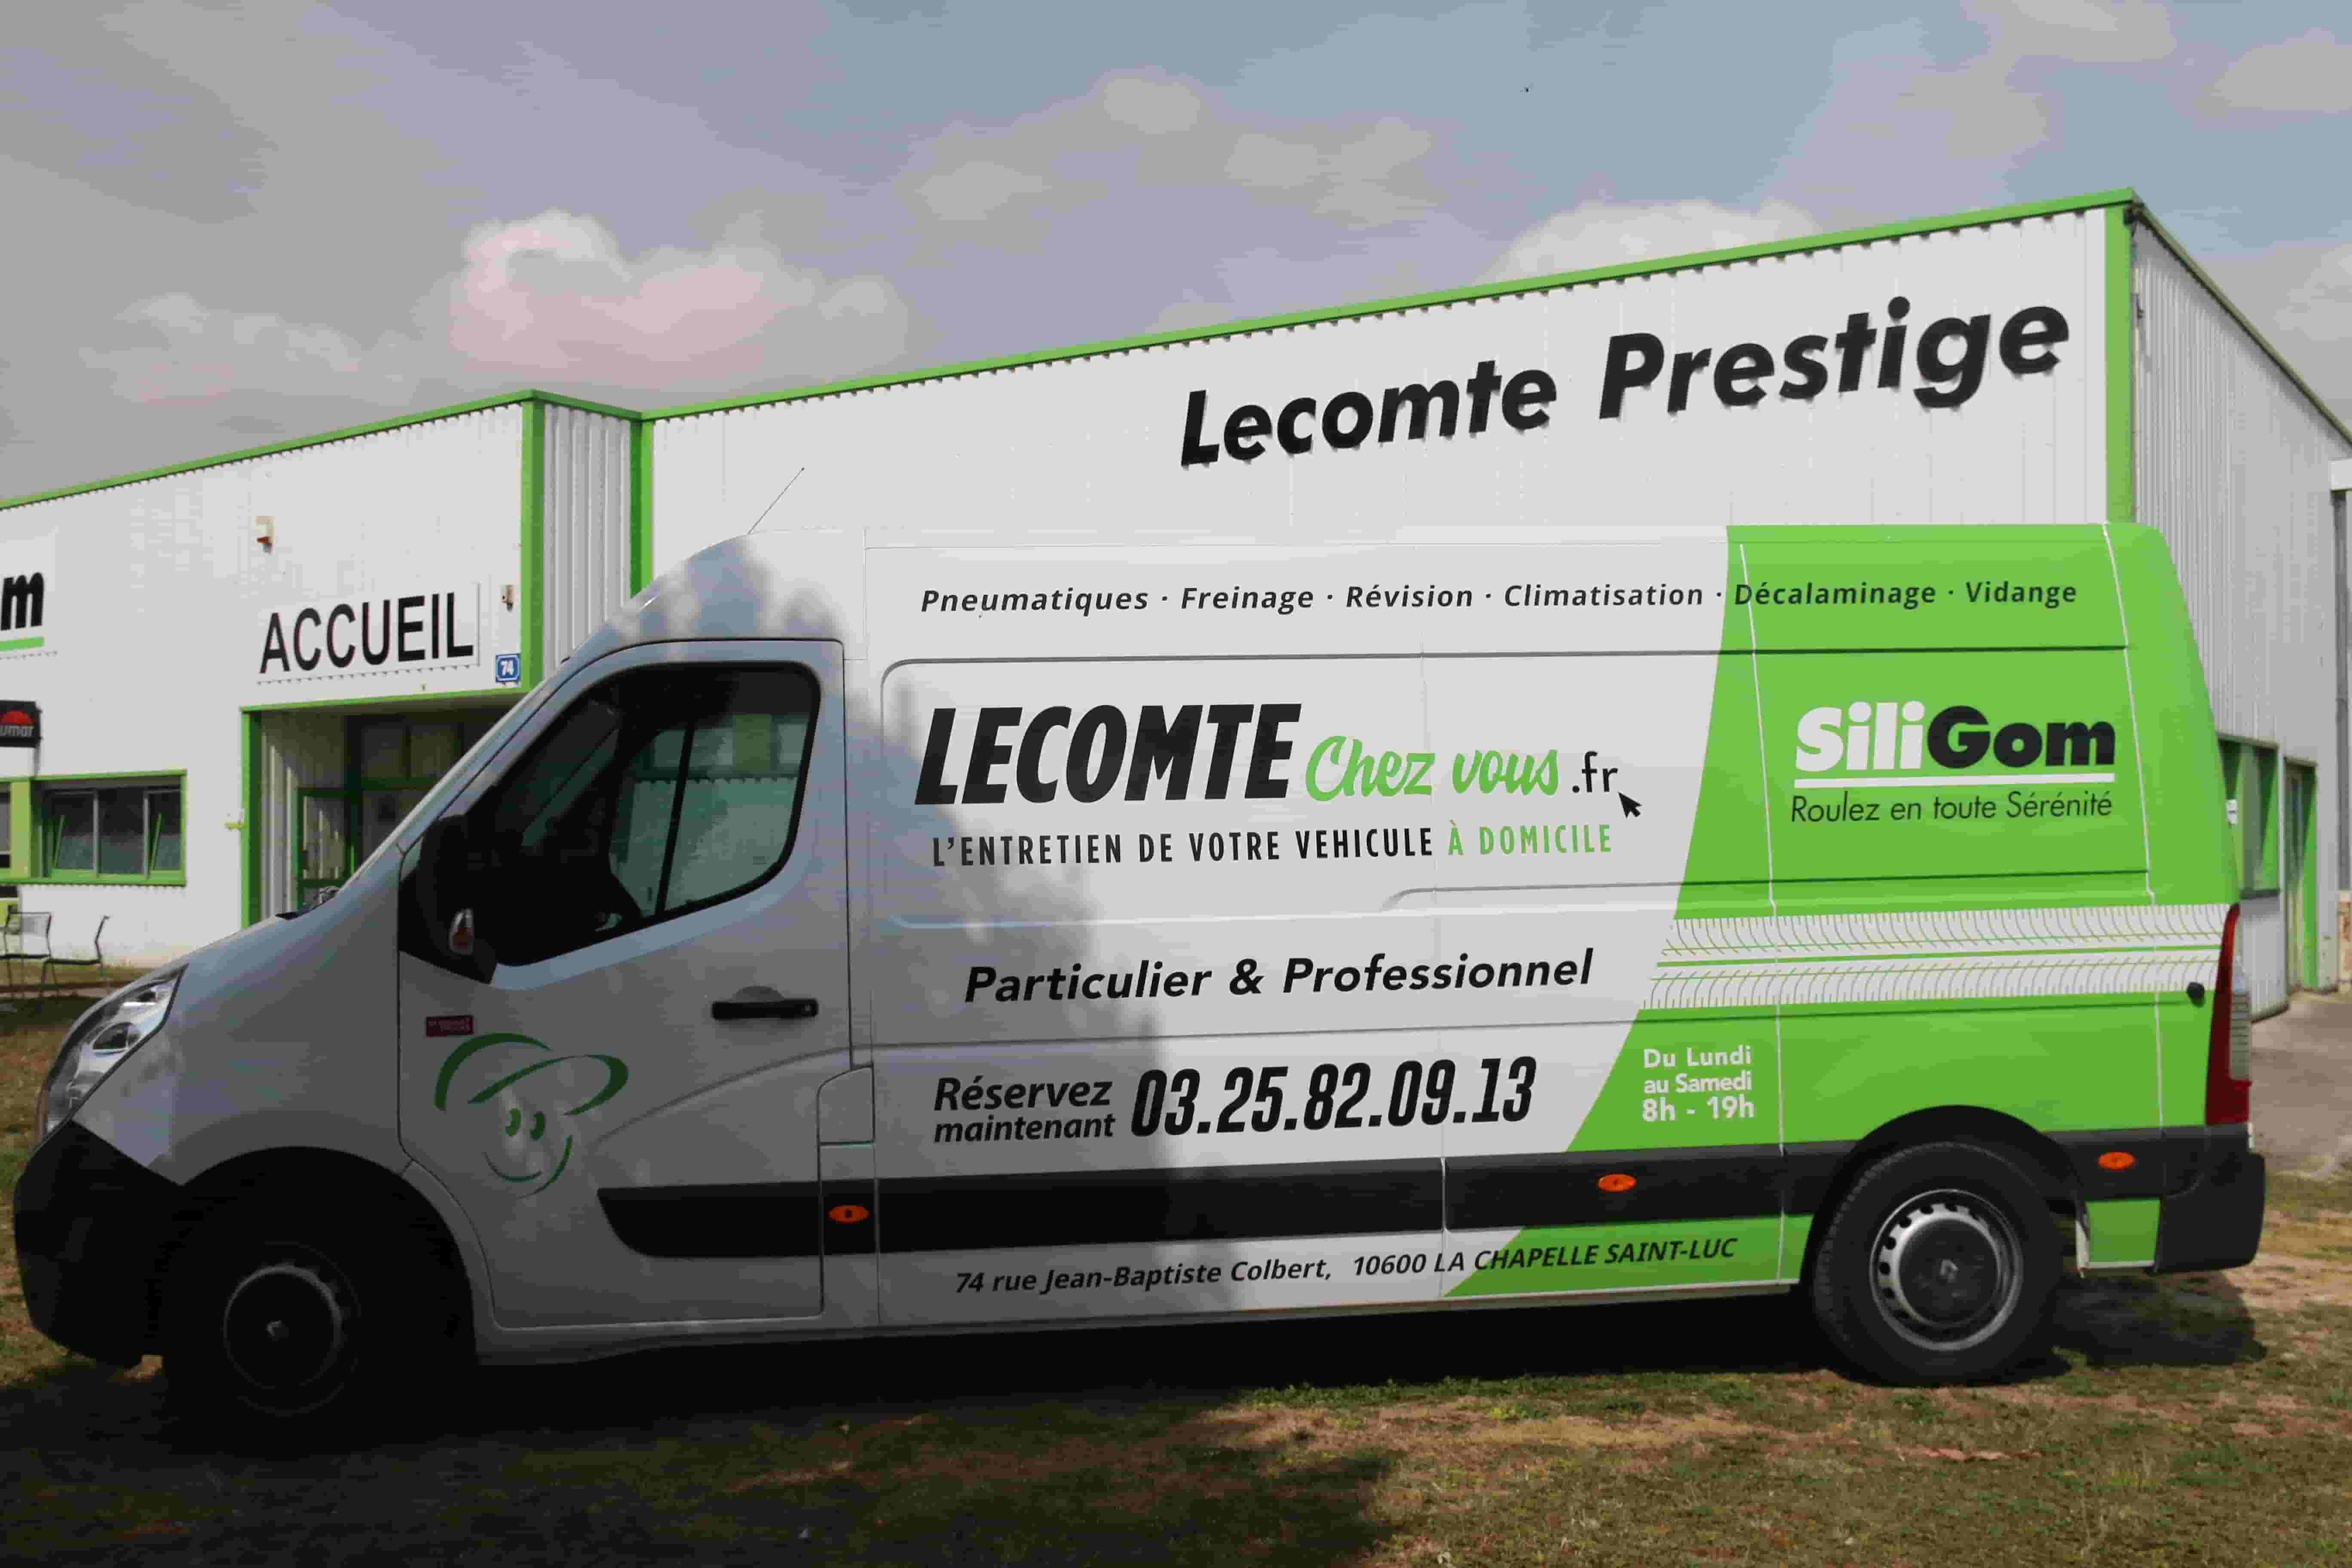 Lecomte Prestige *